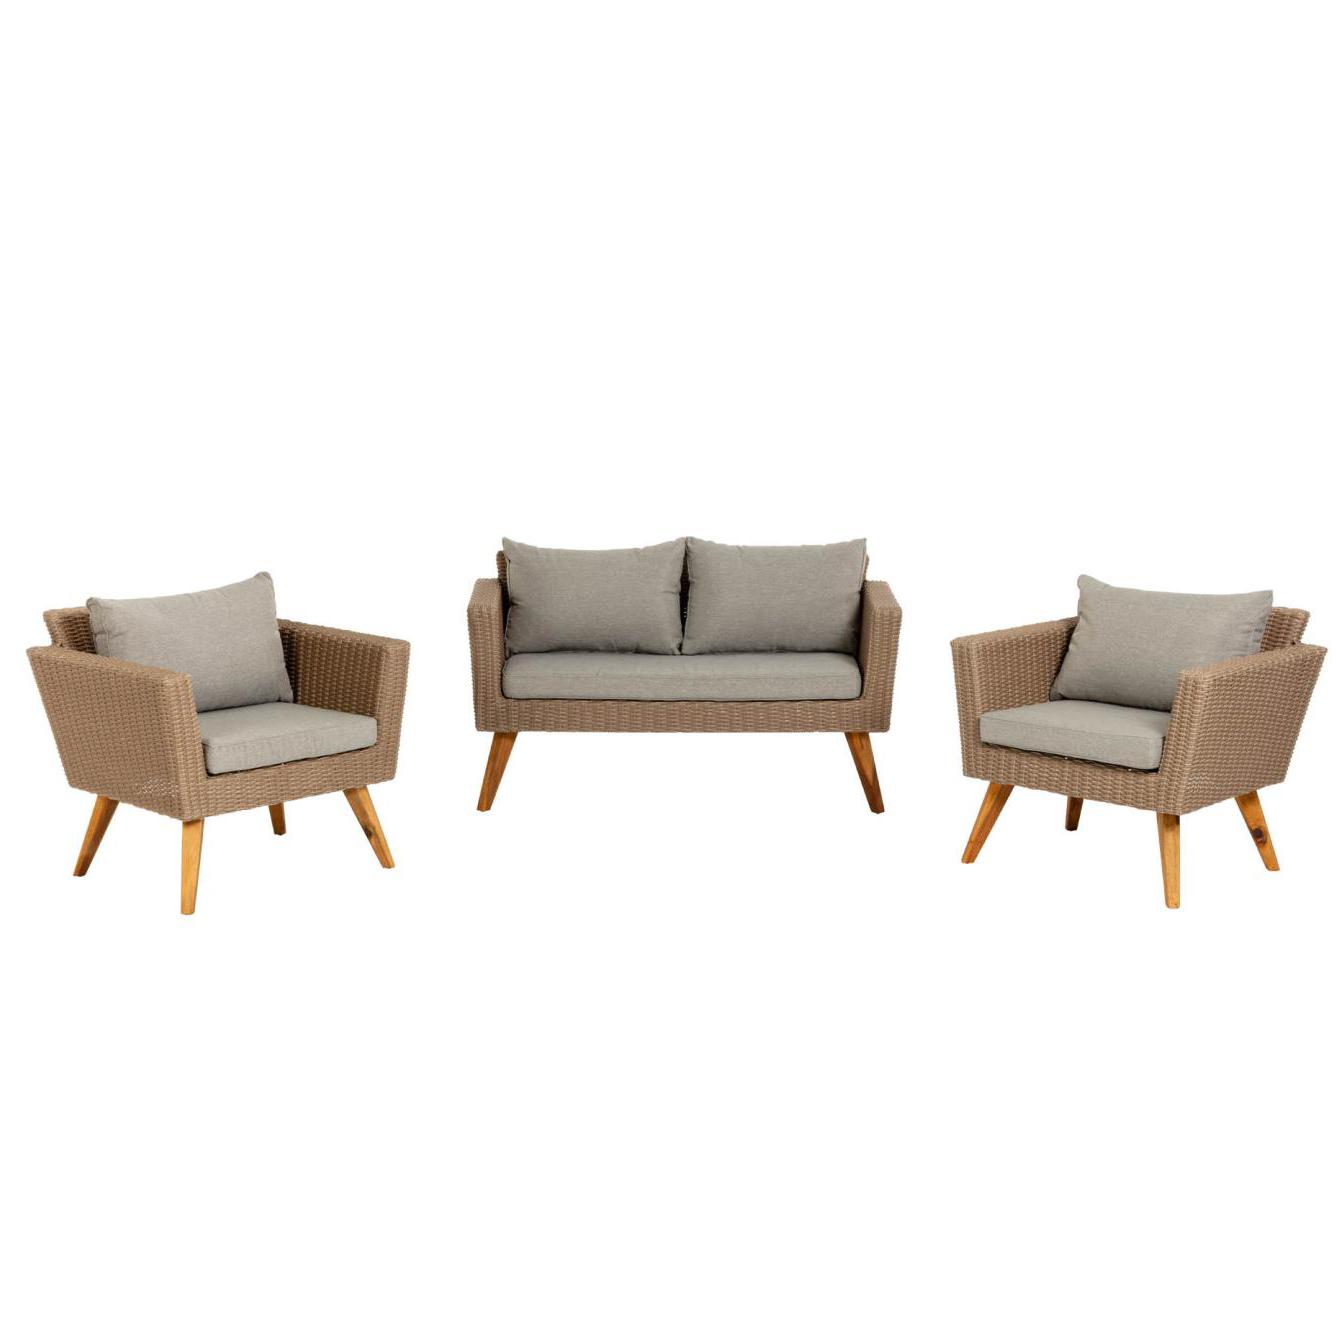 Conjunto Zummer, 1x sofá, 2x cadeirões, vime sintético, cinza